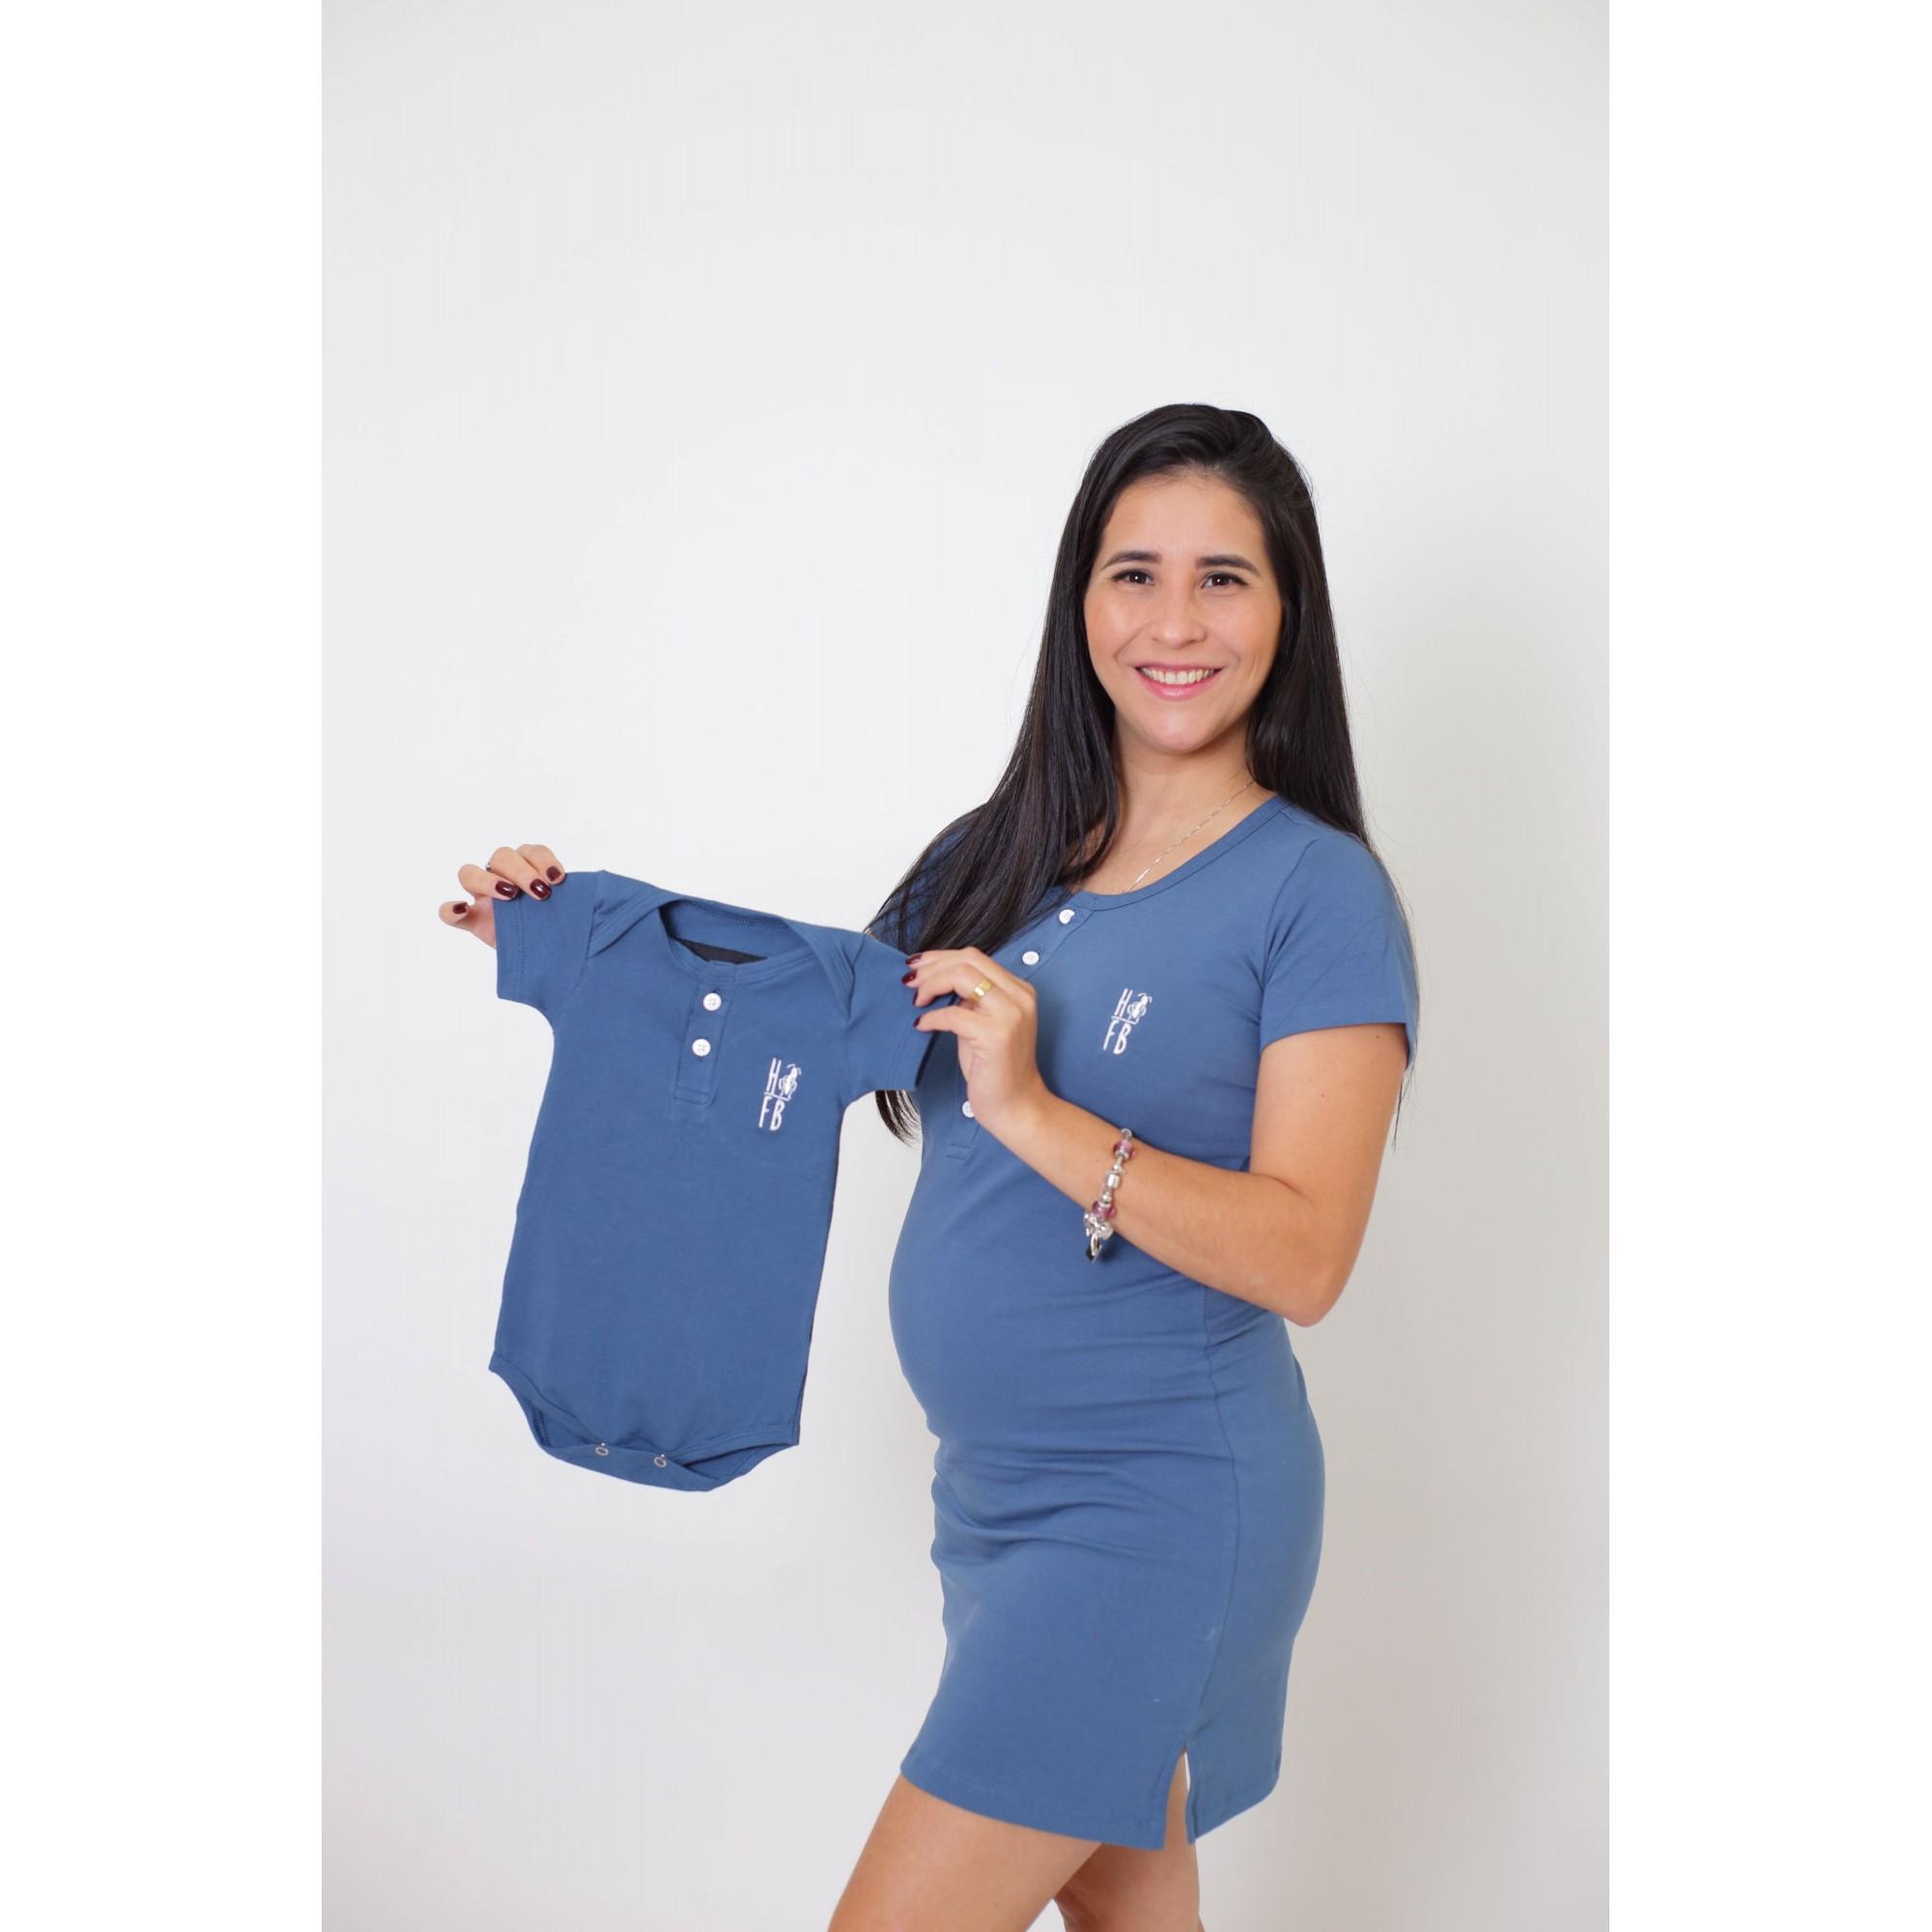 MÃE E FILHOS > Kit Vestido + Body Unissex Infantil - Henley - Azul Petróleo [Coleção Tal Mãe Tal Filhos]